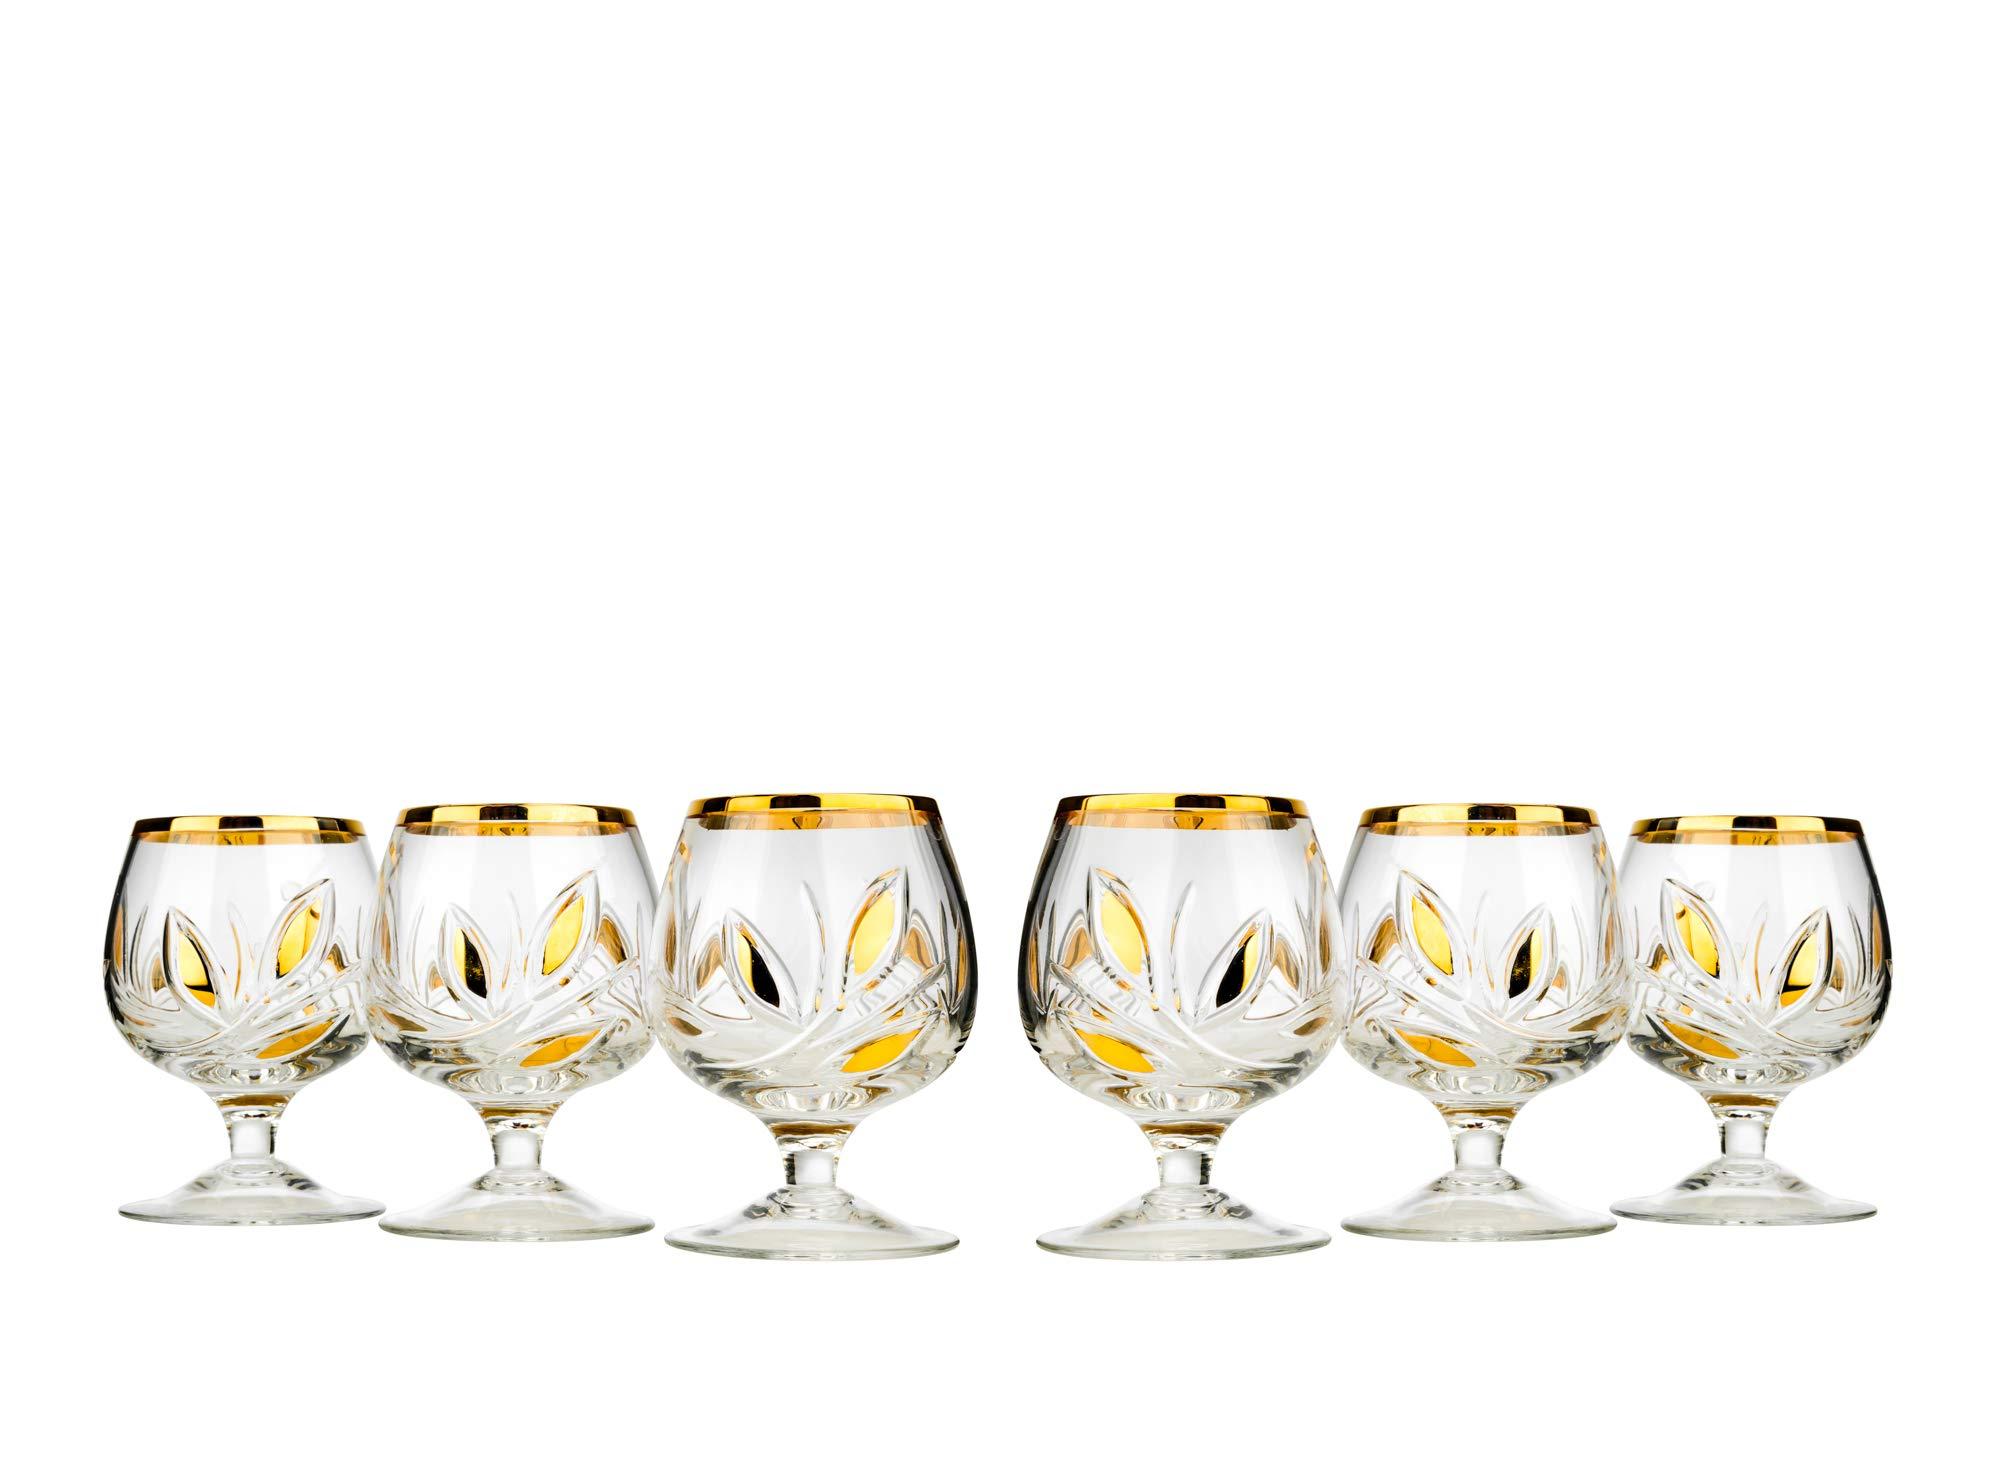 Neman GS5290G, Set of 6 Crystal Wine Glasses (7 Oz) and 6 Shot Glasses (1.7 Oz), Stemware, Stemmed Glasses